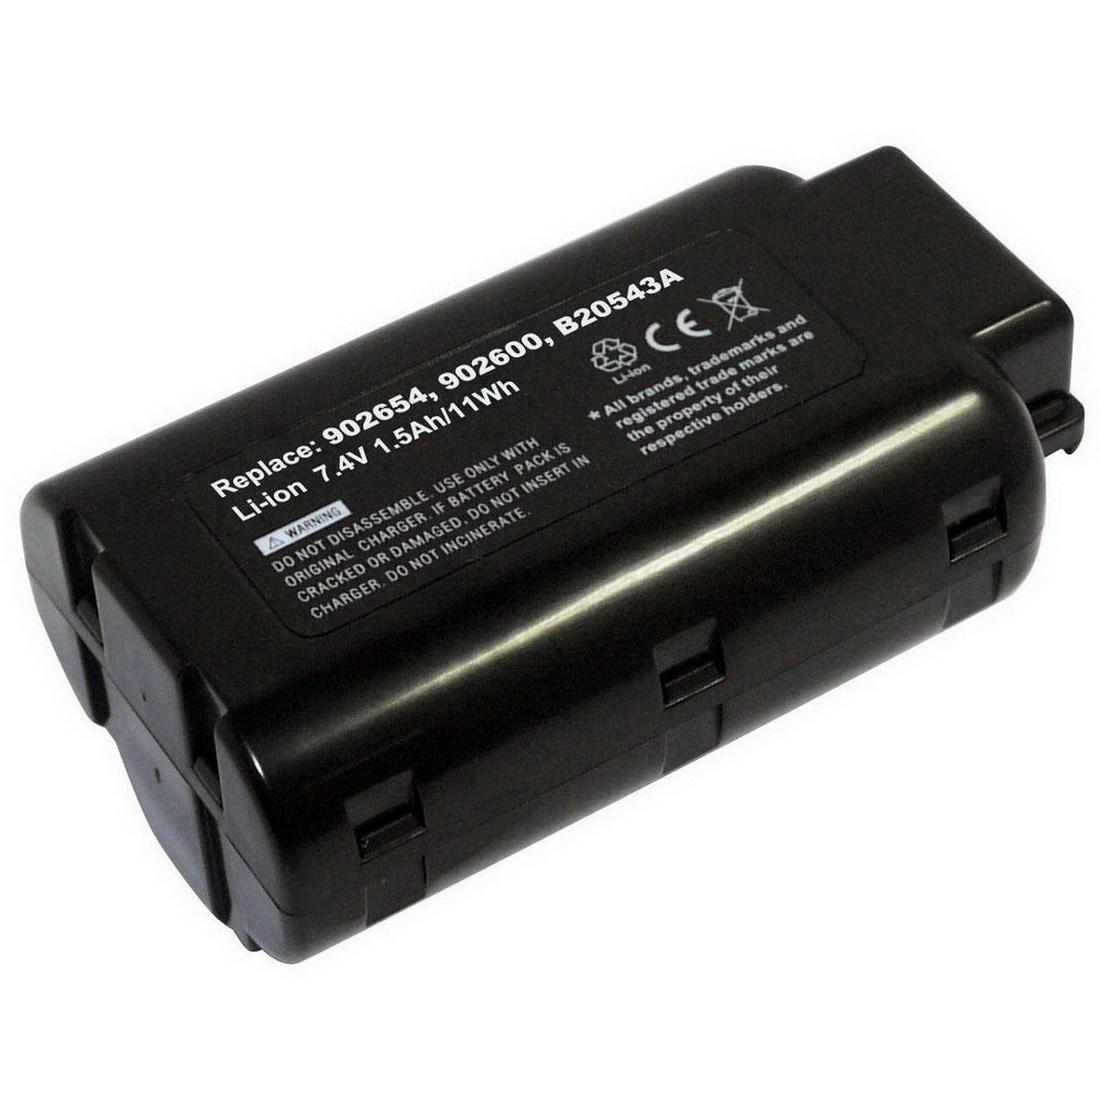 Impulse 7.4V 1500mAh Lithium-Ion Tool Battery Black